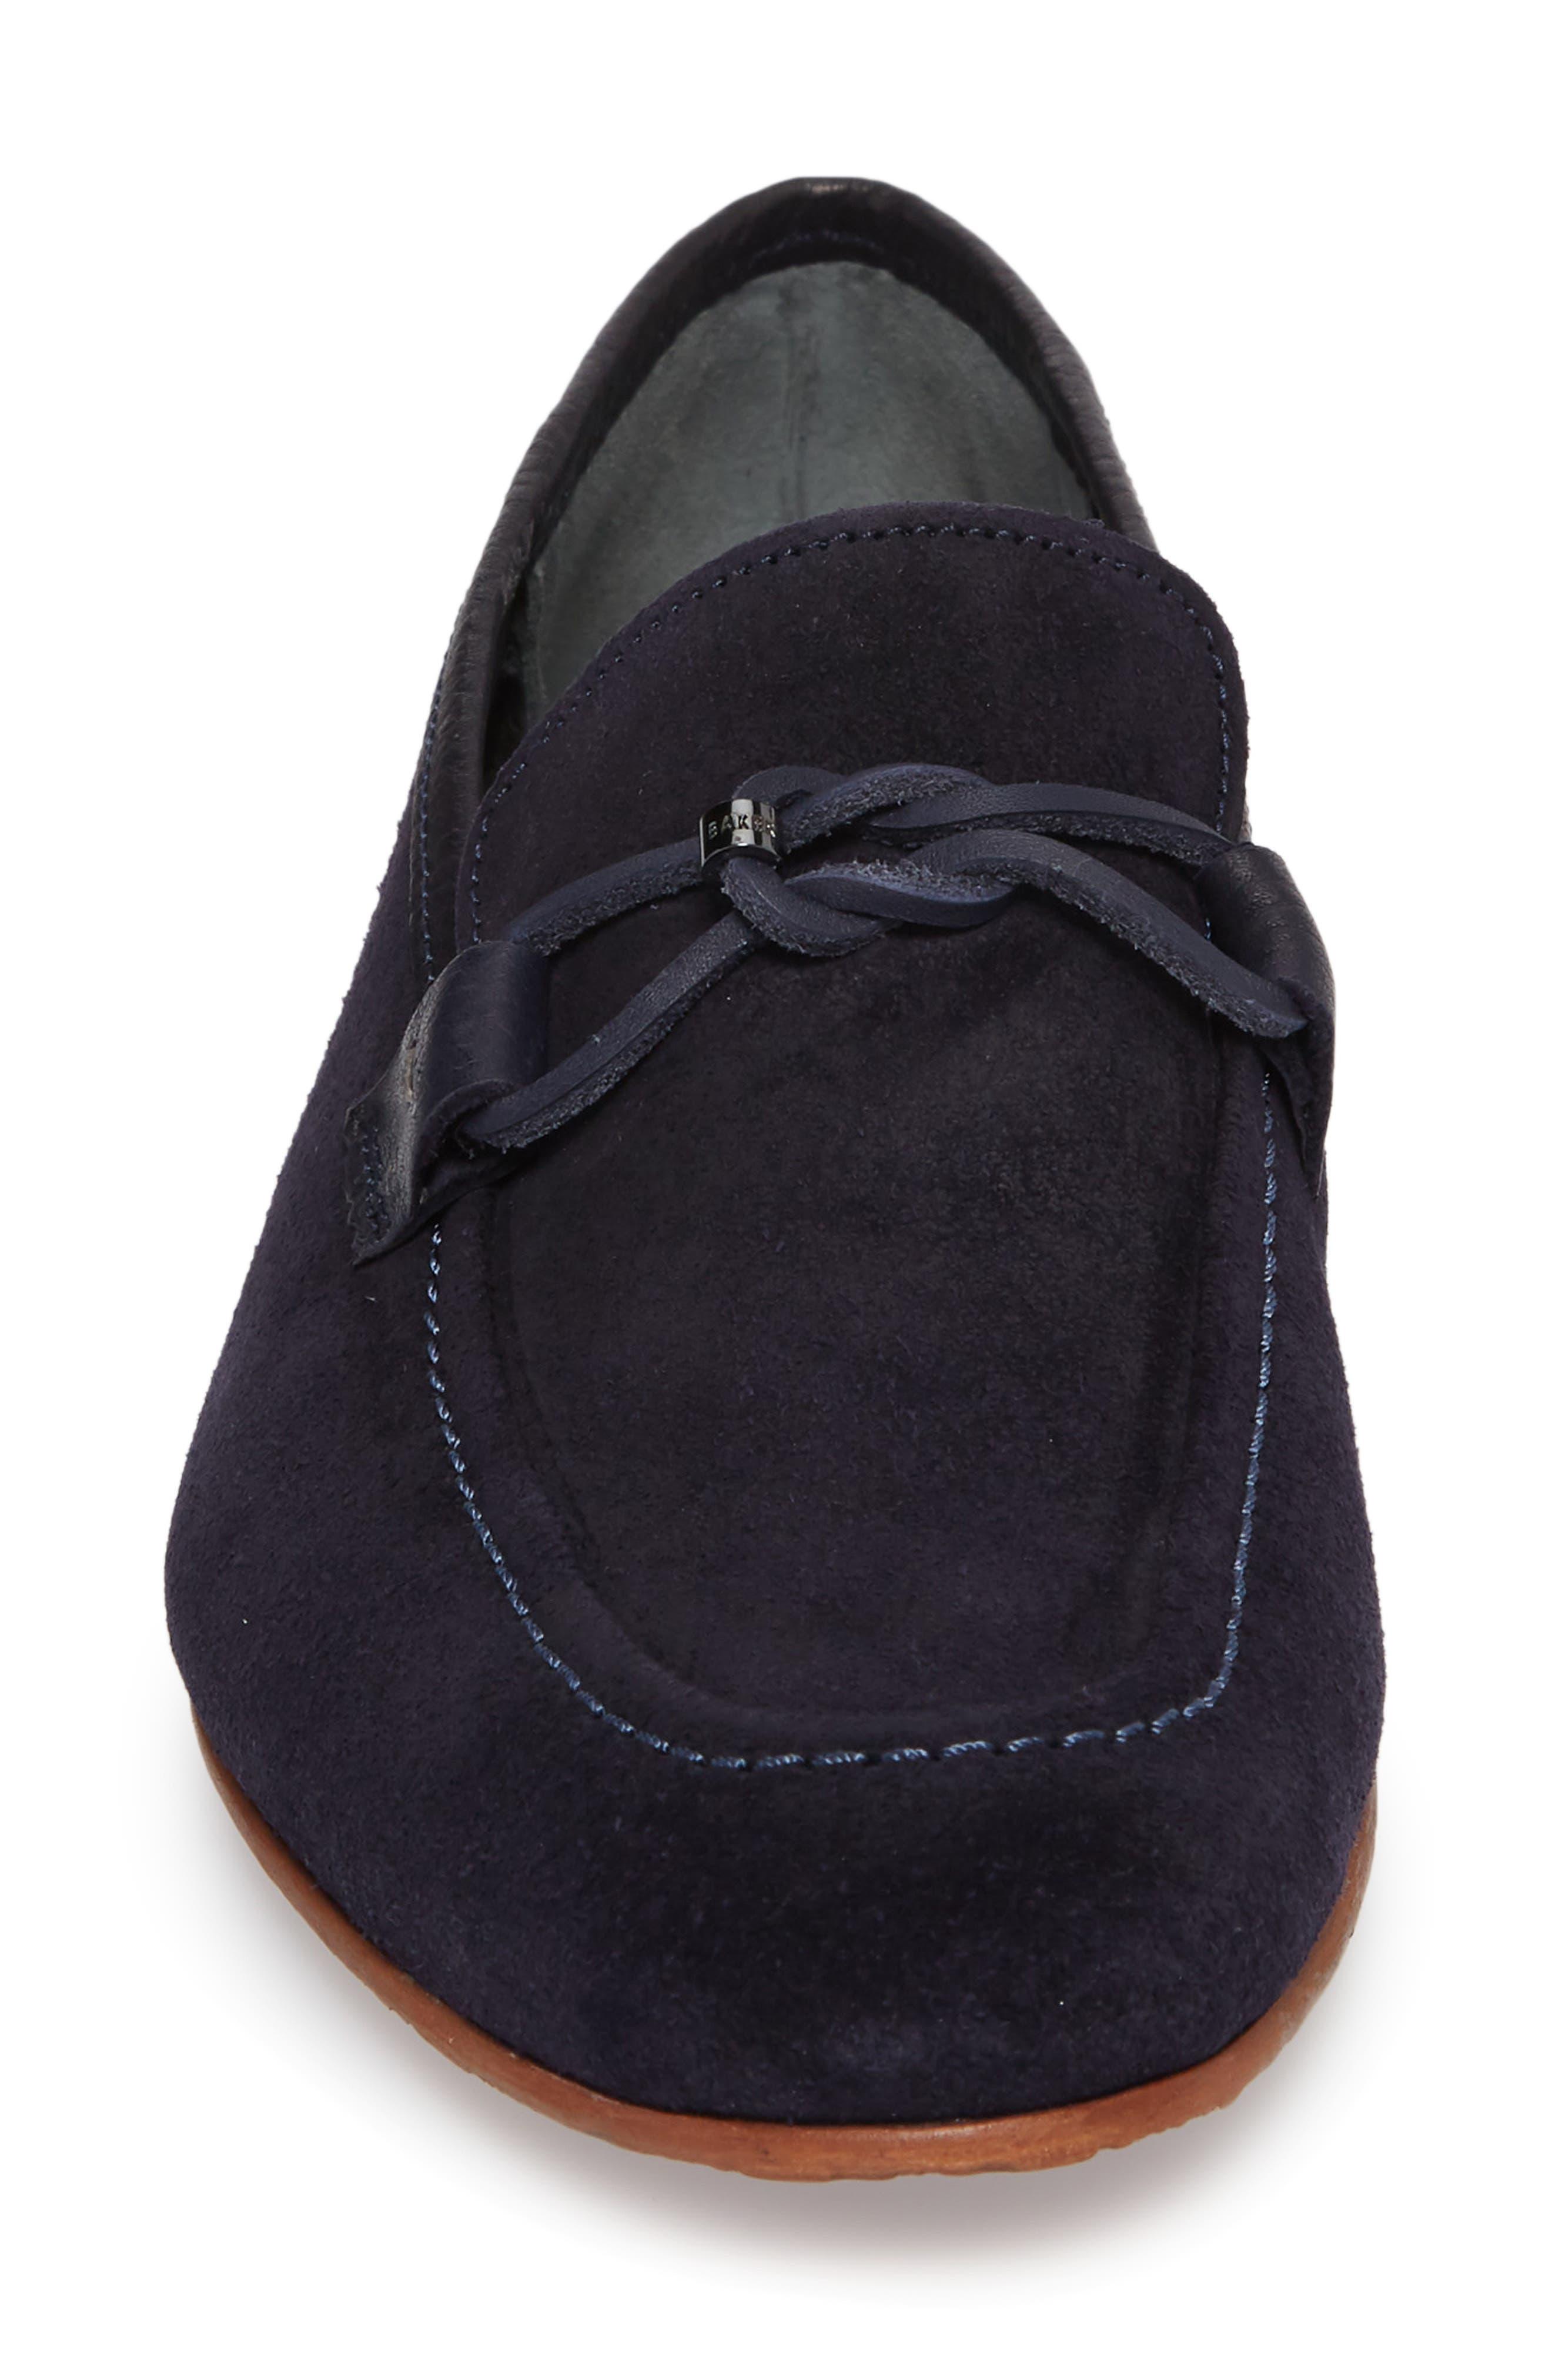 Hoppken Convertible Knotted Loafer,                             Alternate thumbnail 4, color,                             Dark Blue Suede